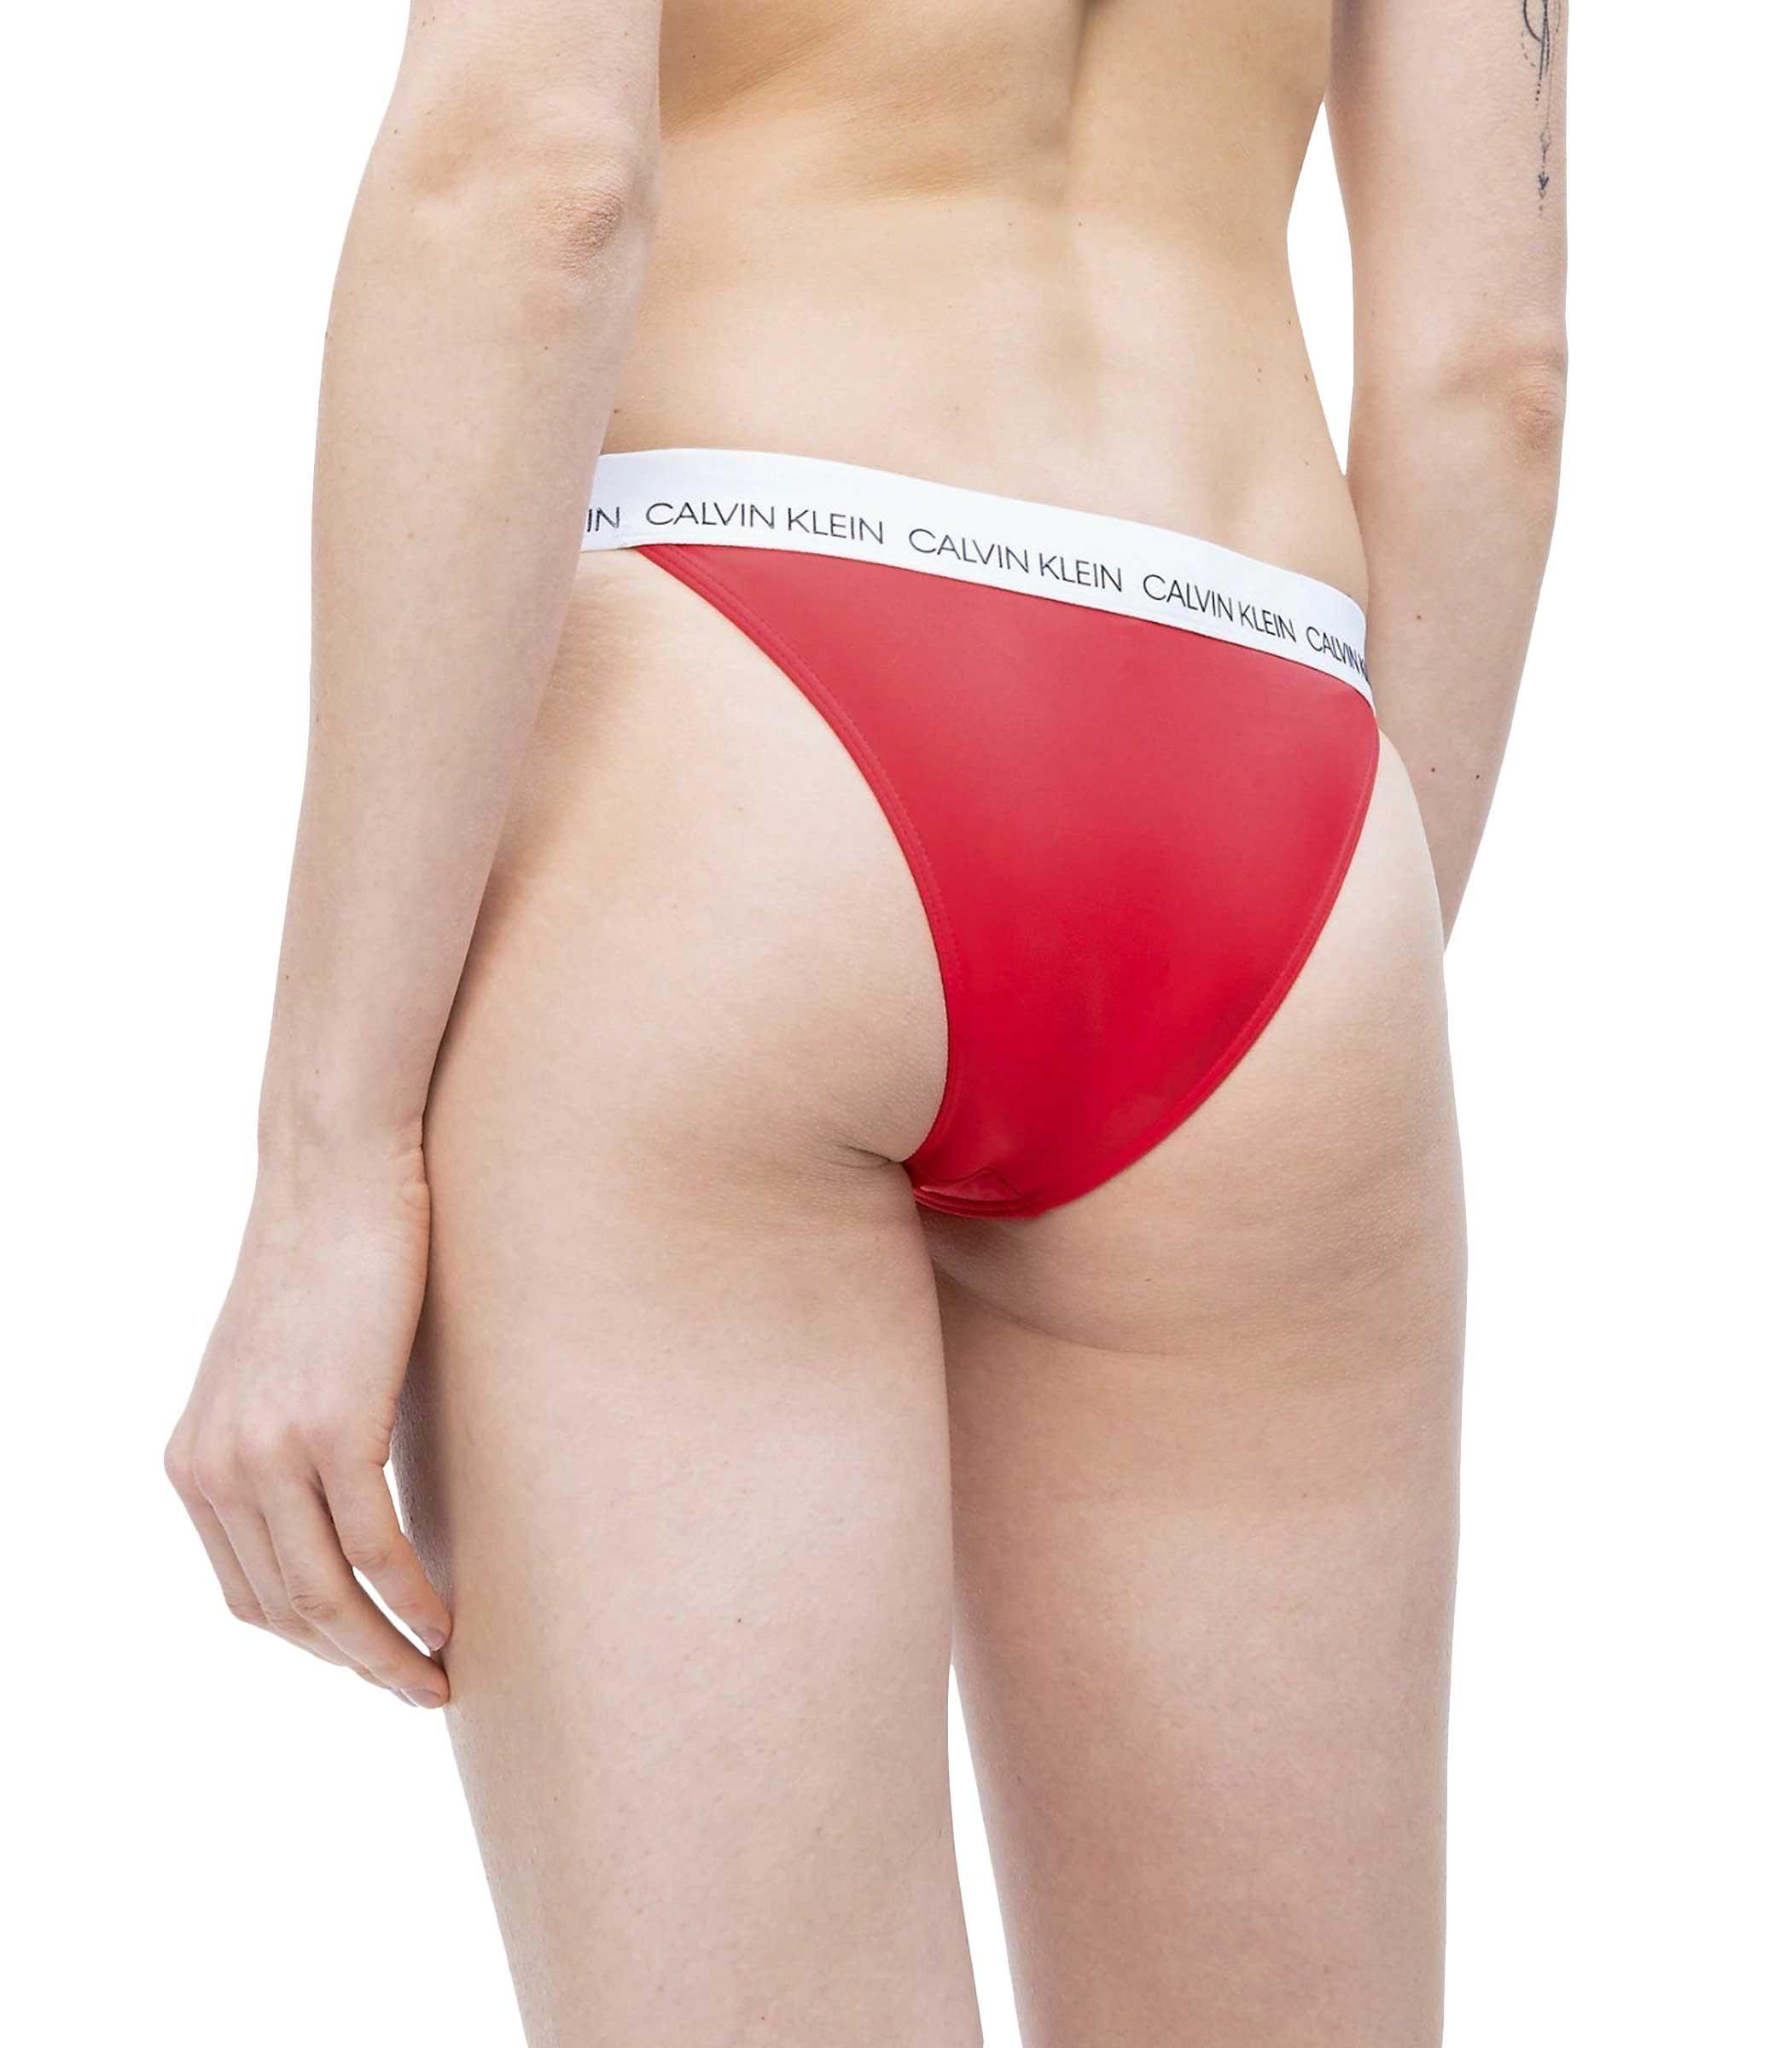 001396d29dfa KW0KW00667 Costume slip bikini brasiliano Calvin Klein con logo da donna  rif.